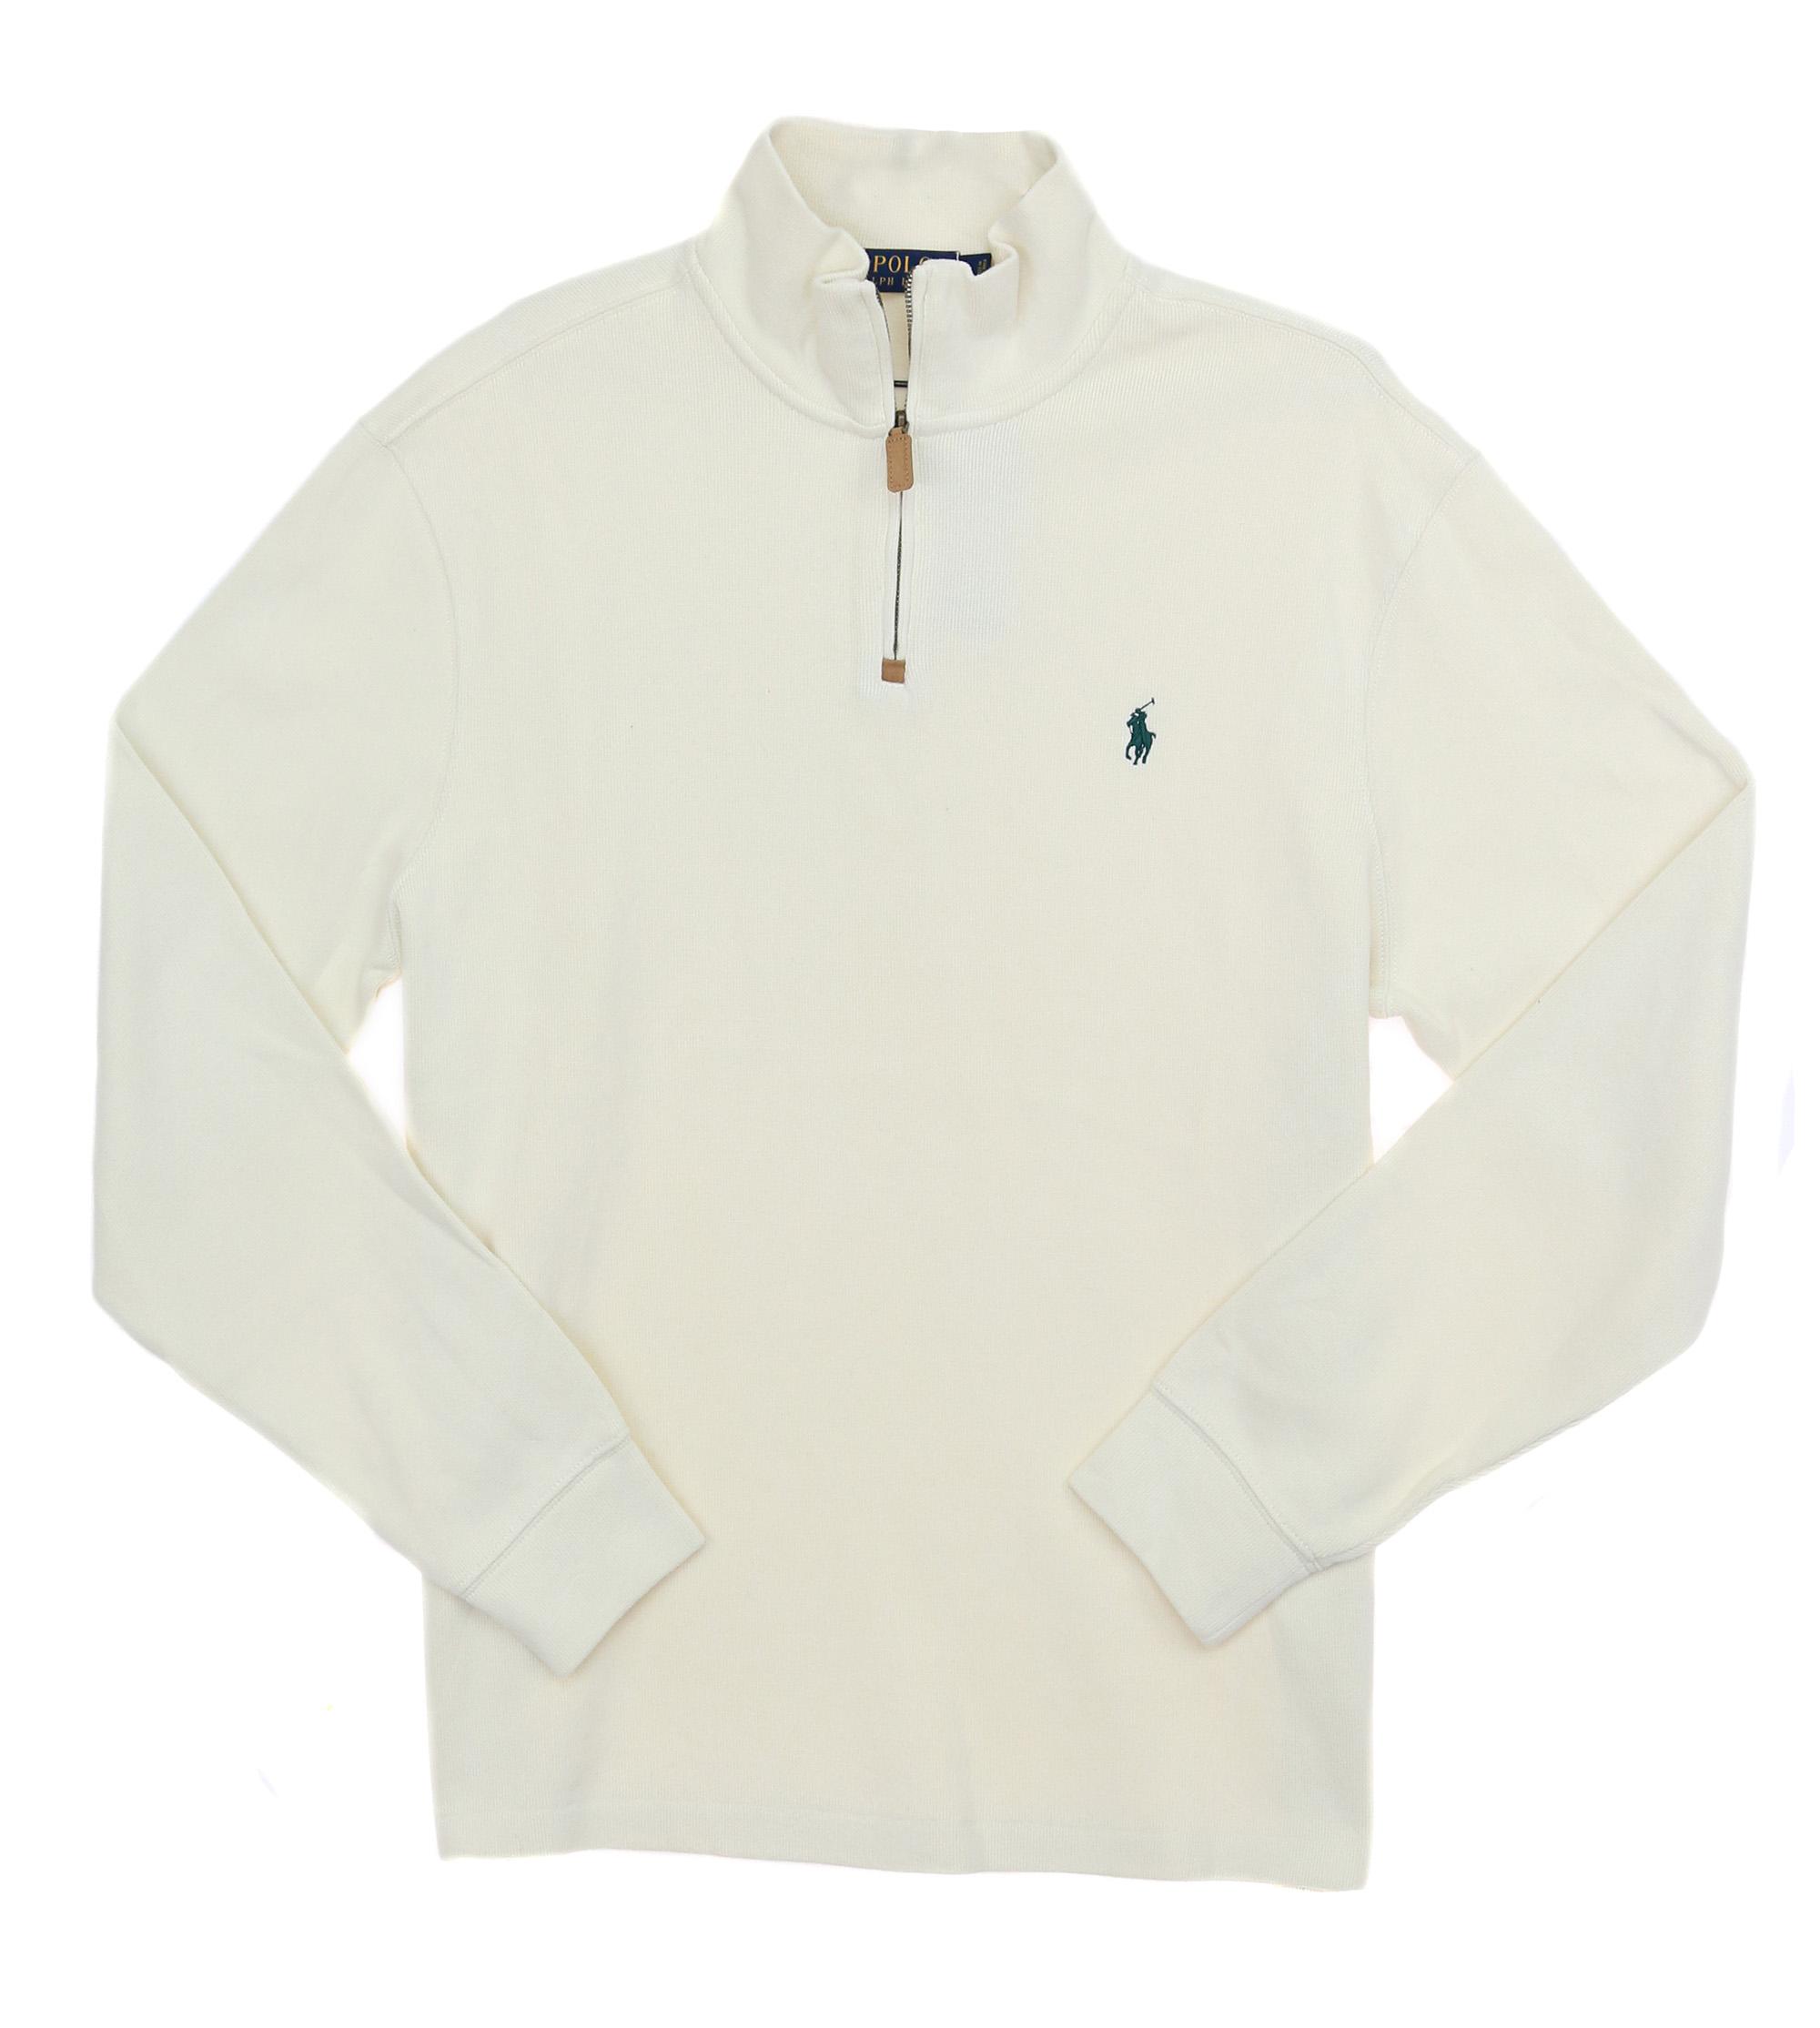 72d5fbda Details about Polo Ralph Lauren Men's French Rib Half Zip Pullover Mockneck  Sweater